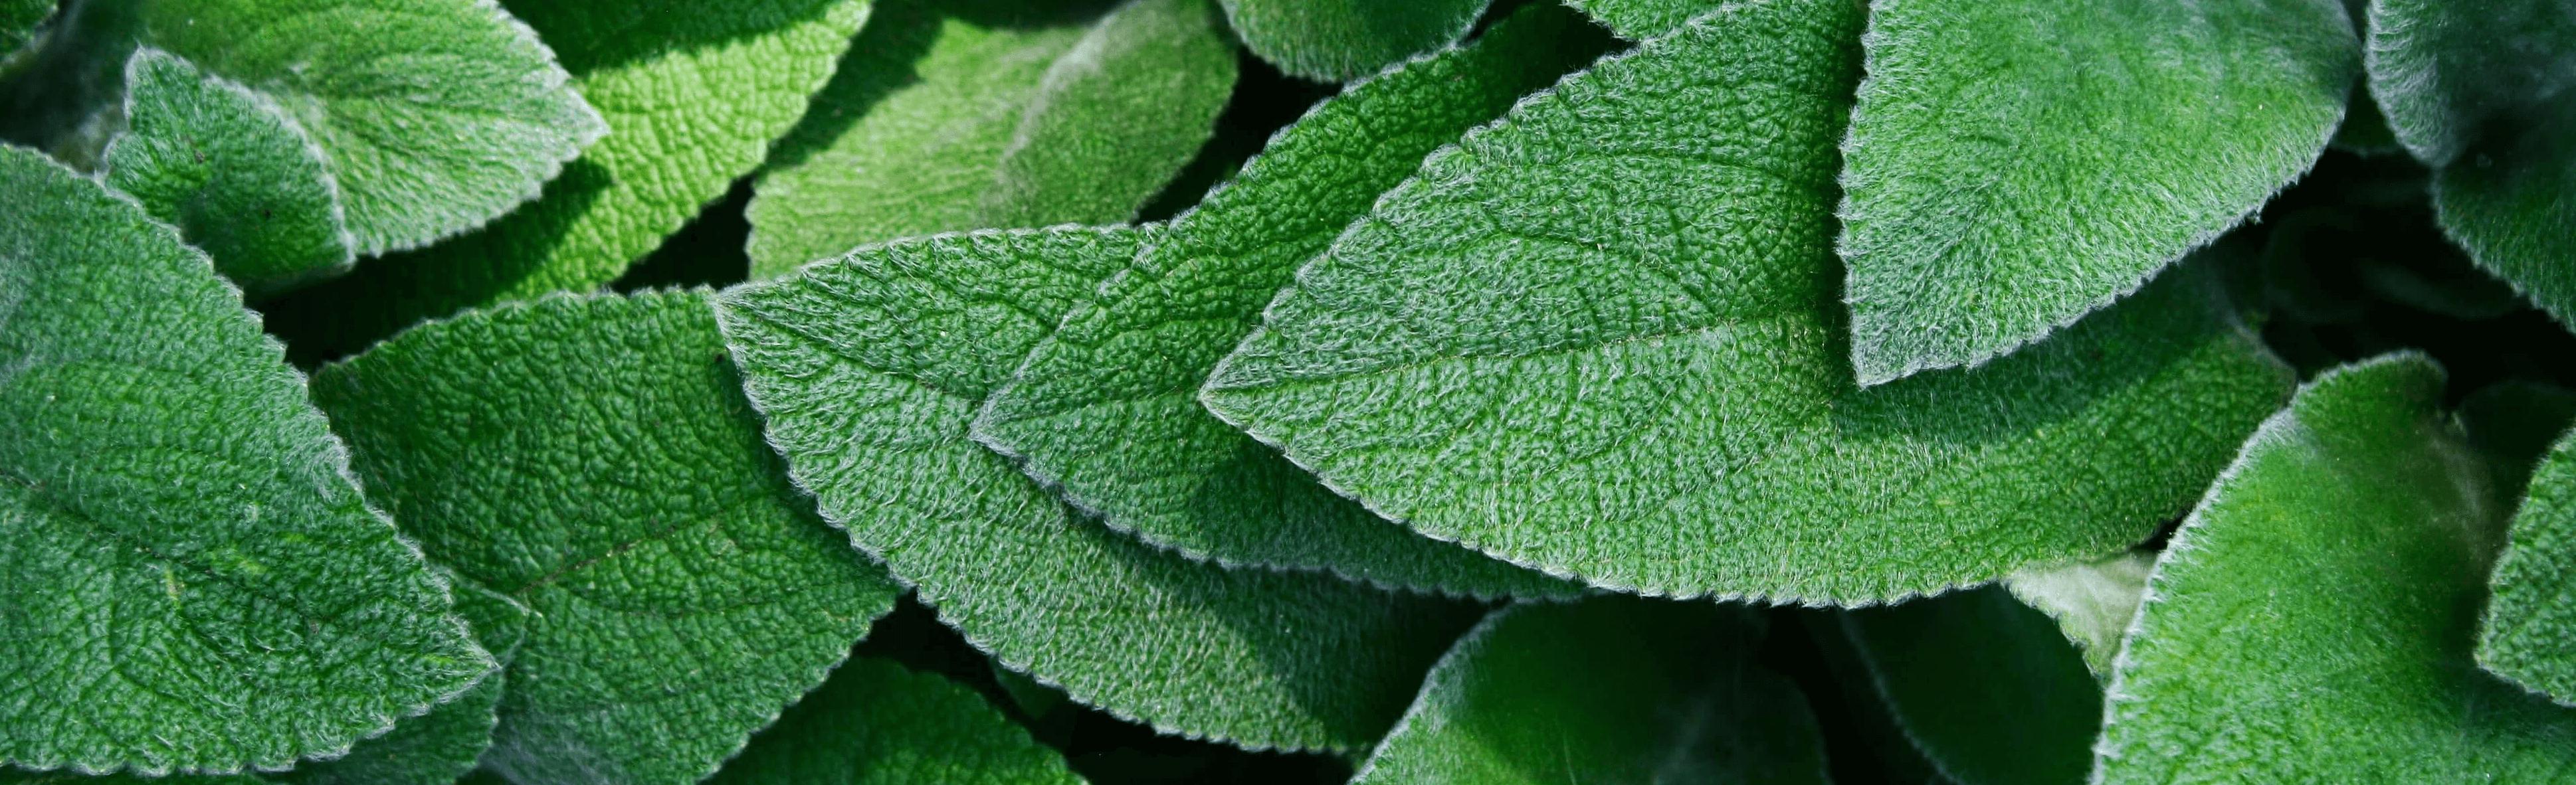 blatter-botanisch-botanischer-garten-1113145